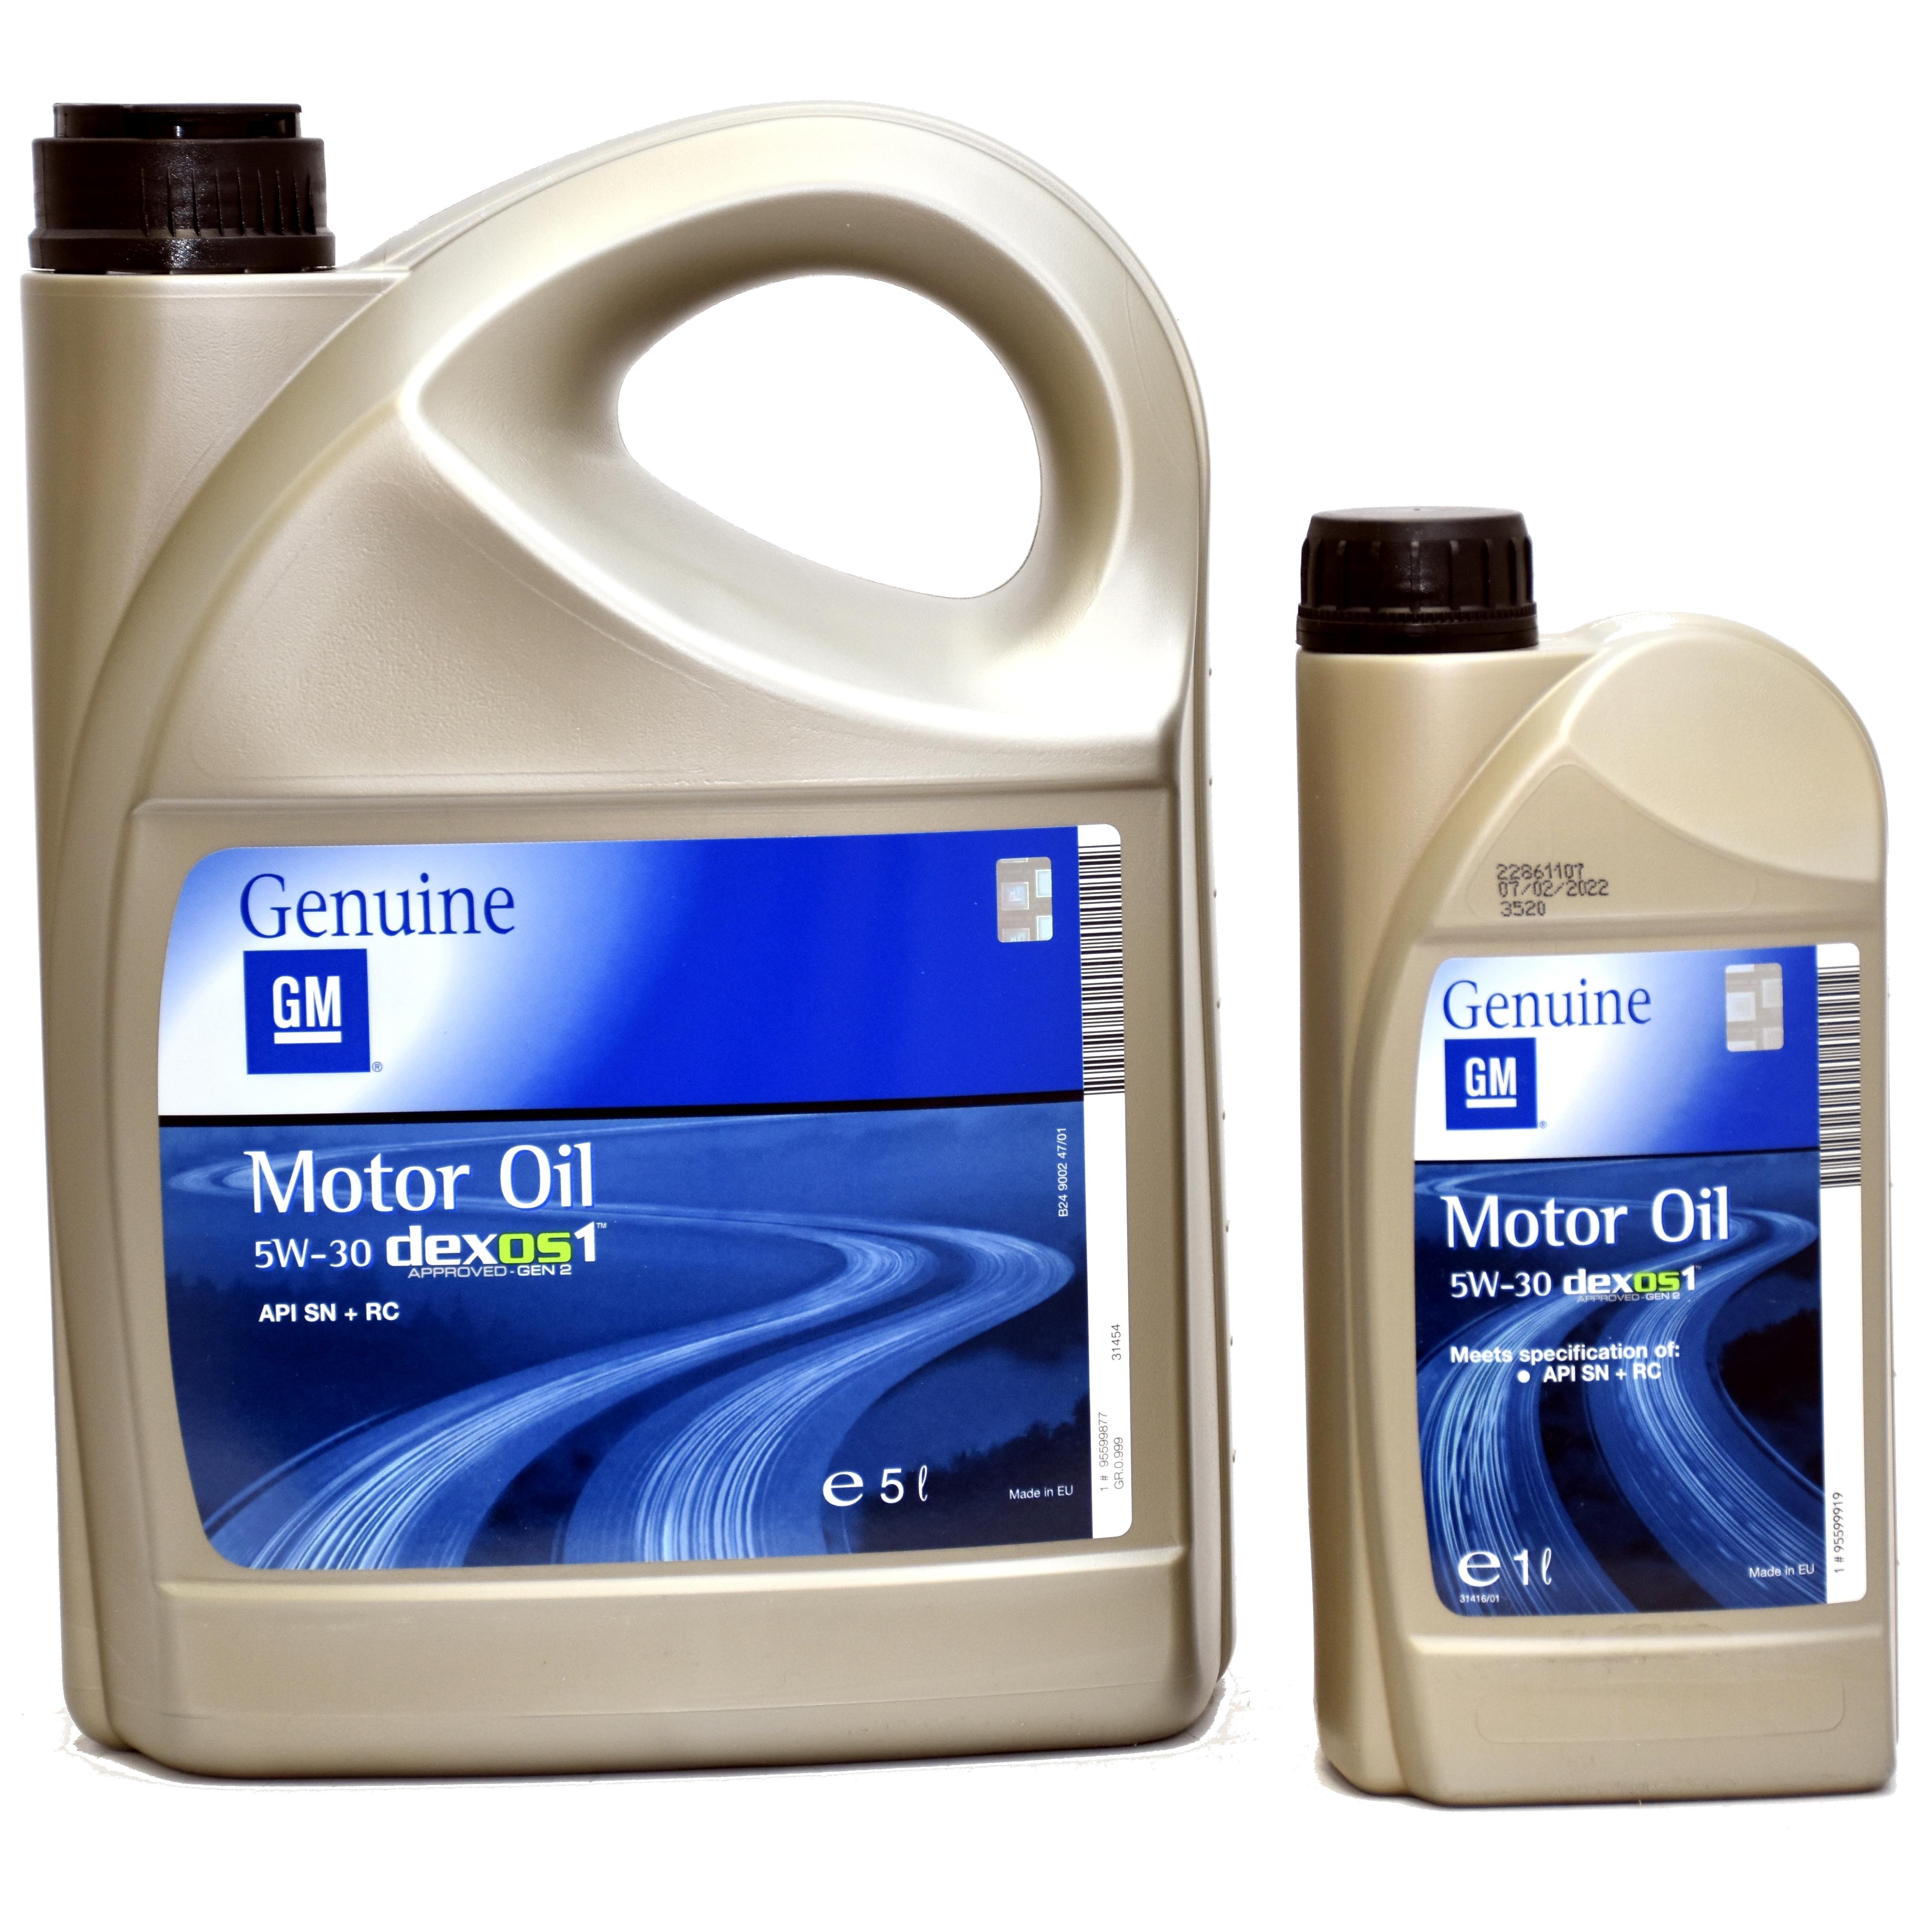 genuine opel gm 5w 30 dexos 1 gen2 longlife engine oil. Black Bedroom Furniture Sets. Home Design Ideas